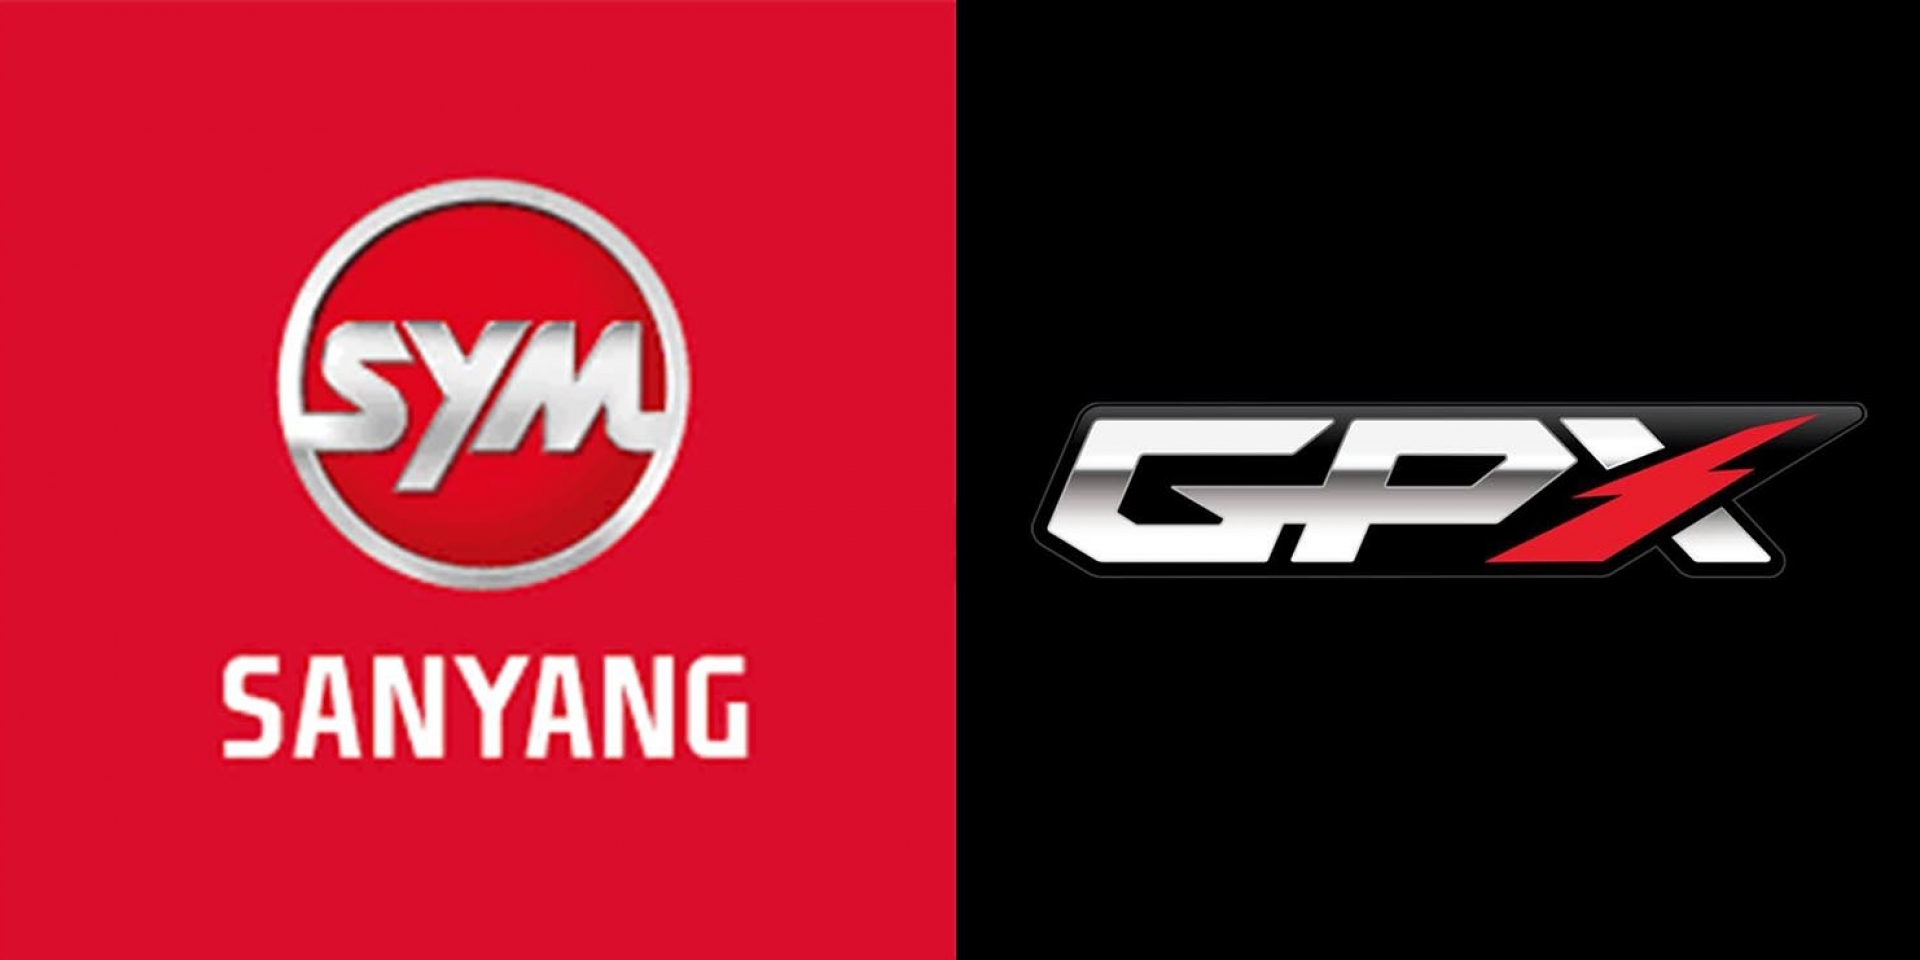 SYM與泰國機車品牌GPX簽約,合作開發速克達車款